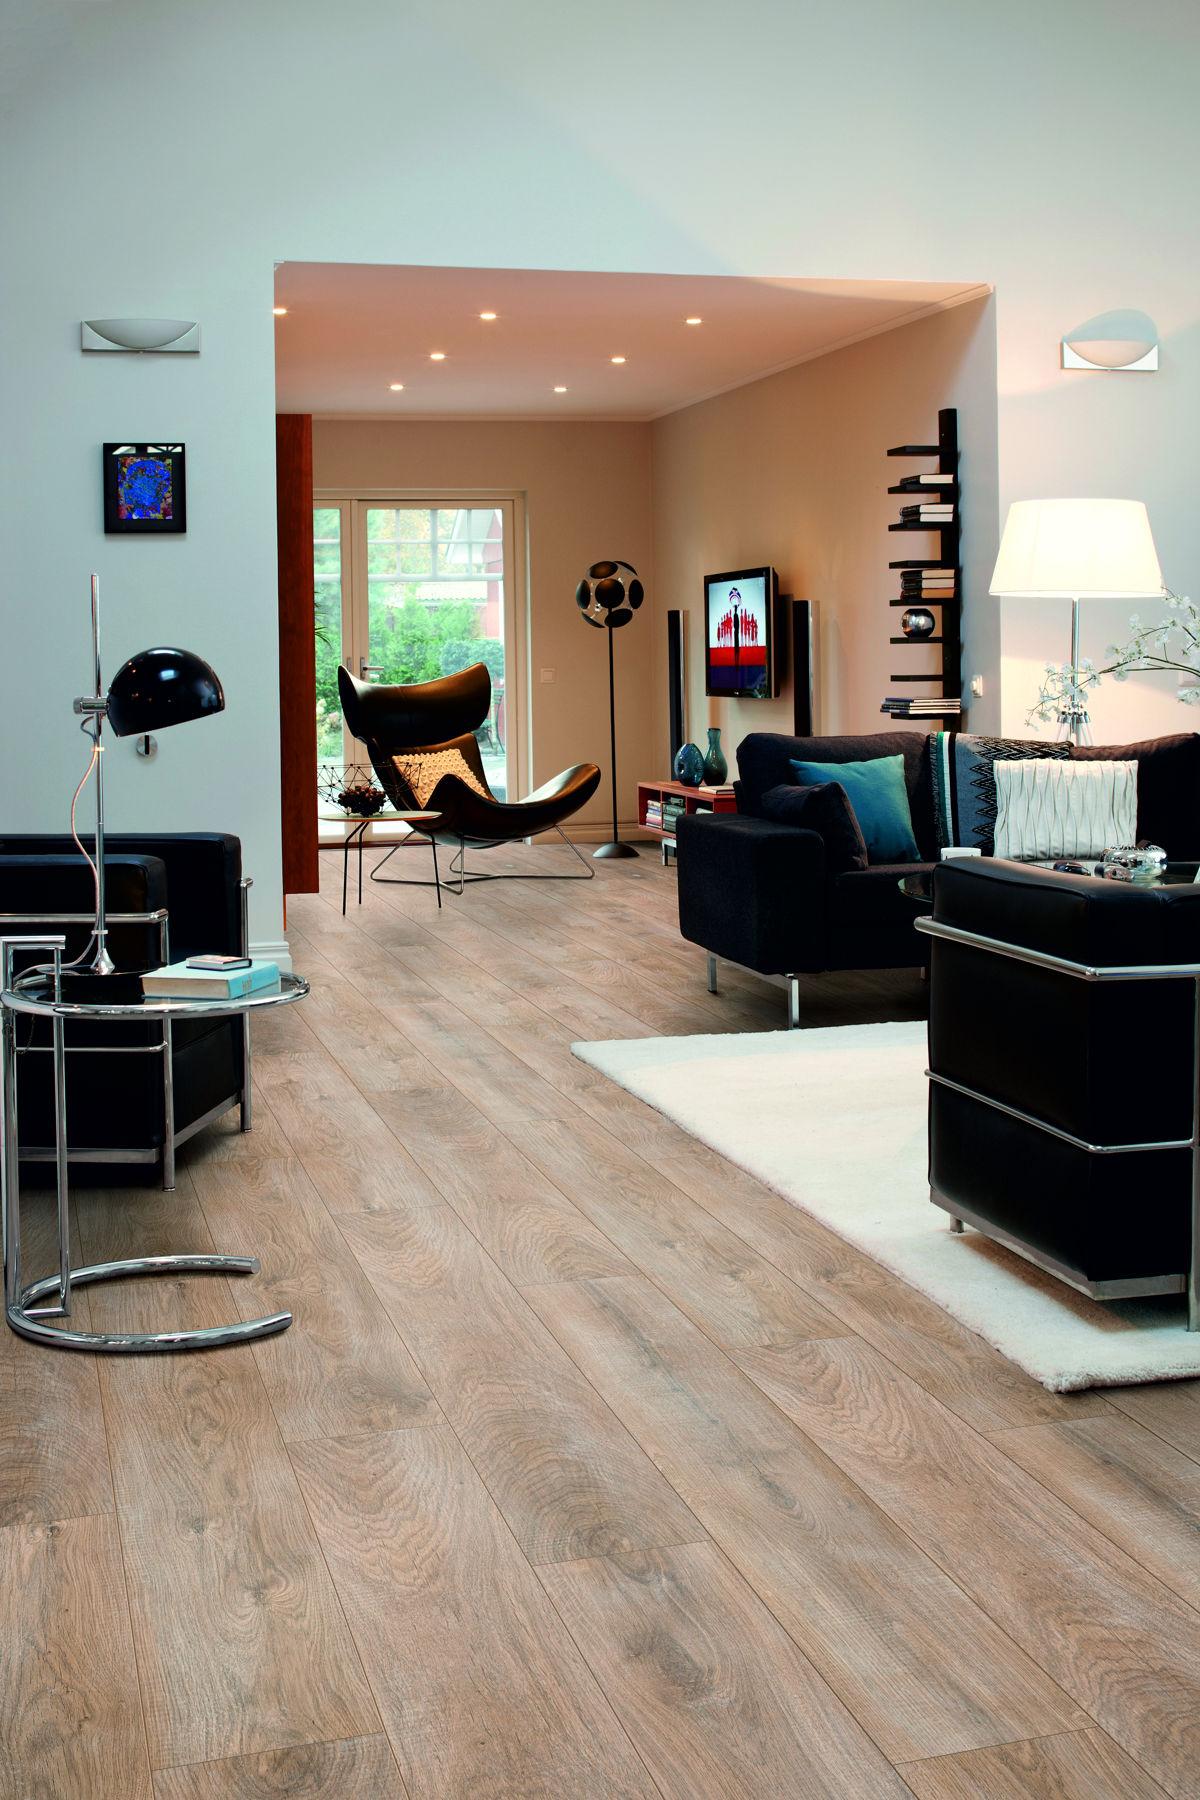 Pergo Laminate Flooring pergo laminate flooring Pergo Living Expression Chalked Blonde Oak Laminate Flooring